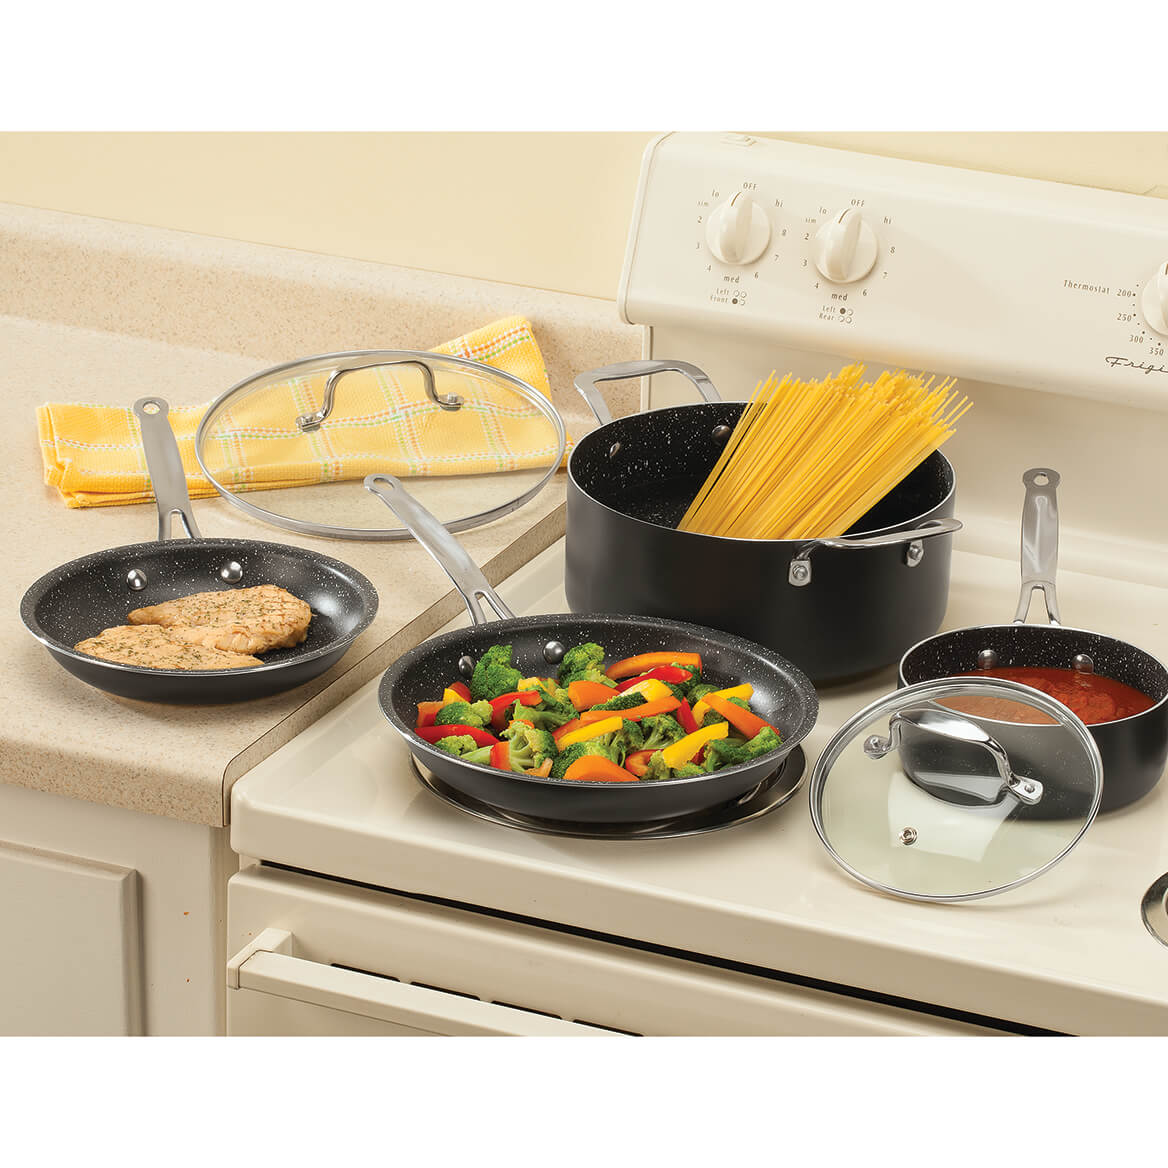 Homestyle Kitchen 6 Piece Non Stick Cookware Set-366688